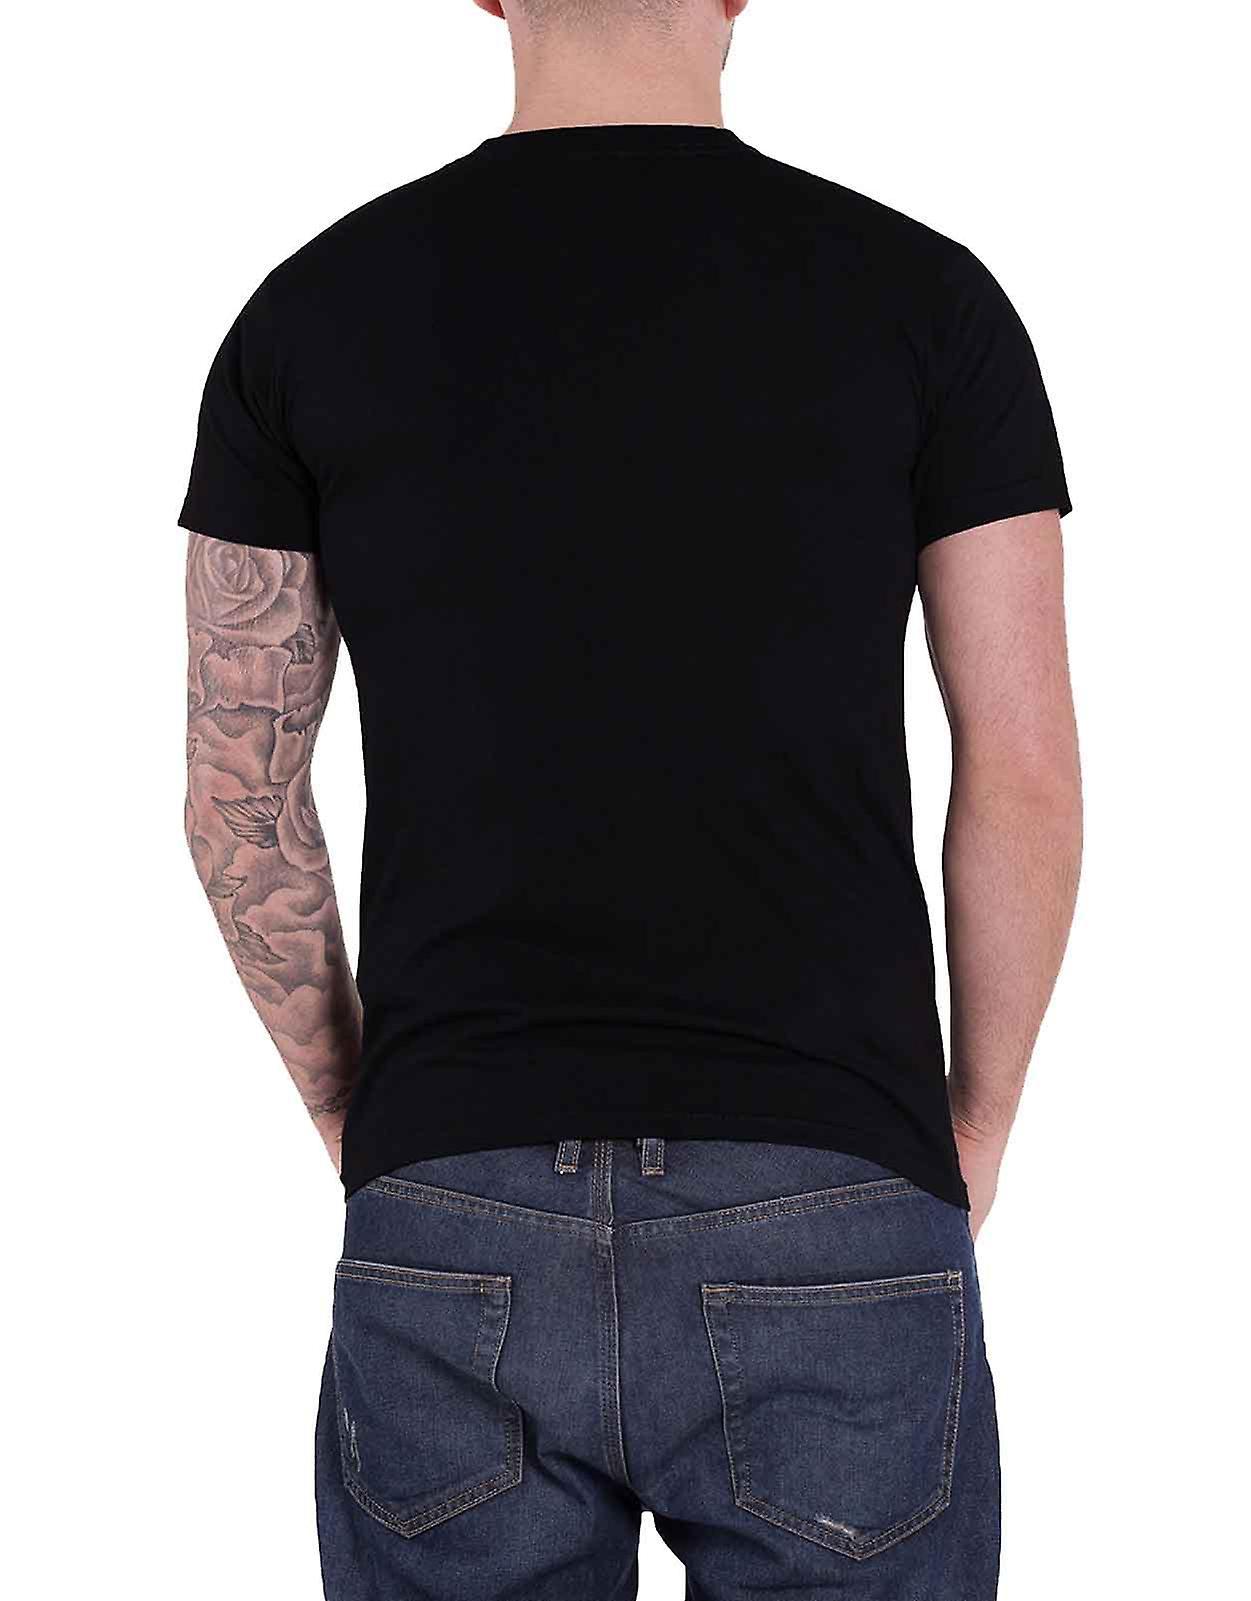 Ghost T Shirt Danse Macabre band Logo new Official Mens Black